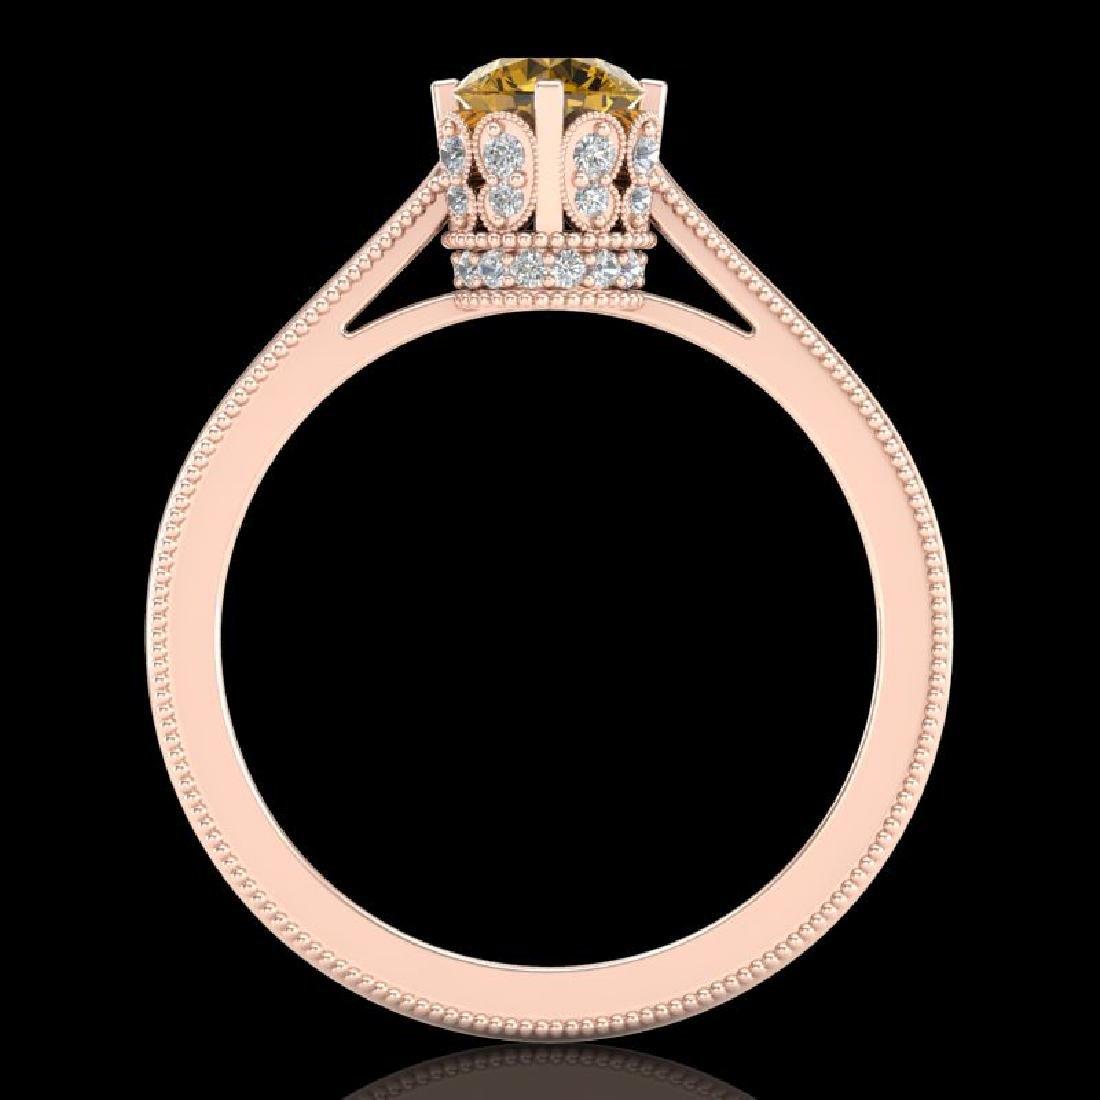 0.81 CTW Intense Fancy Yellow Diamond Engagement Art - 3